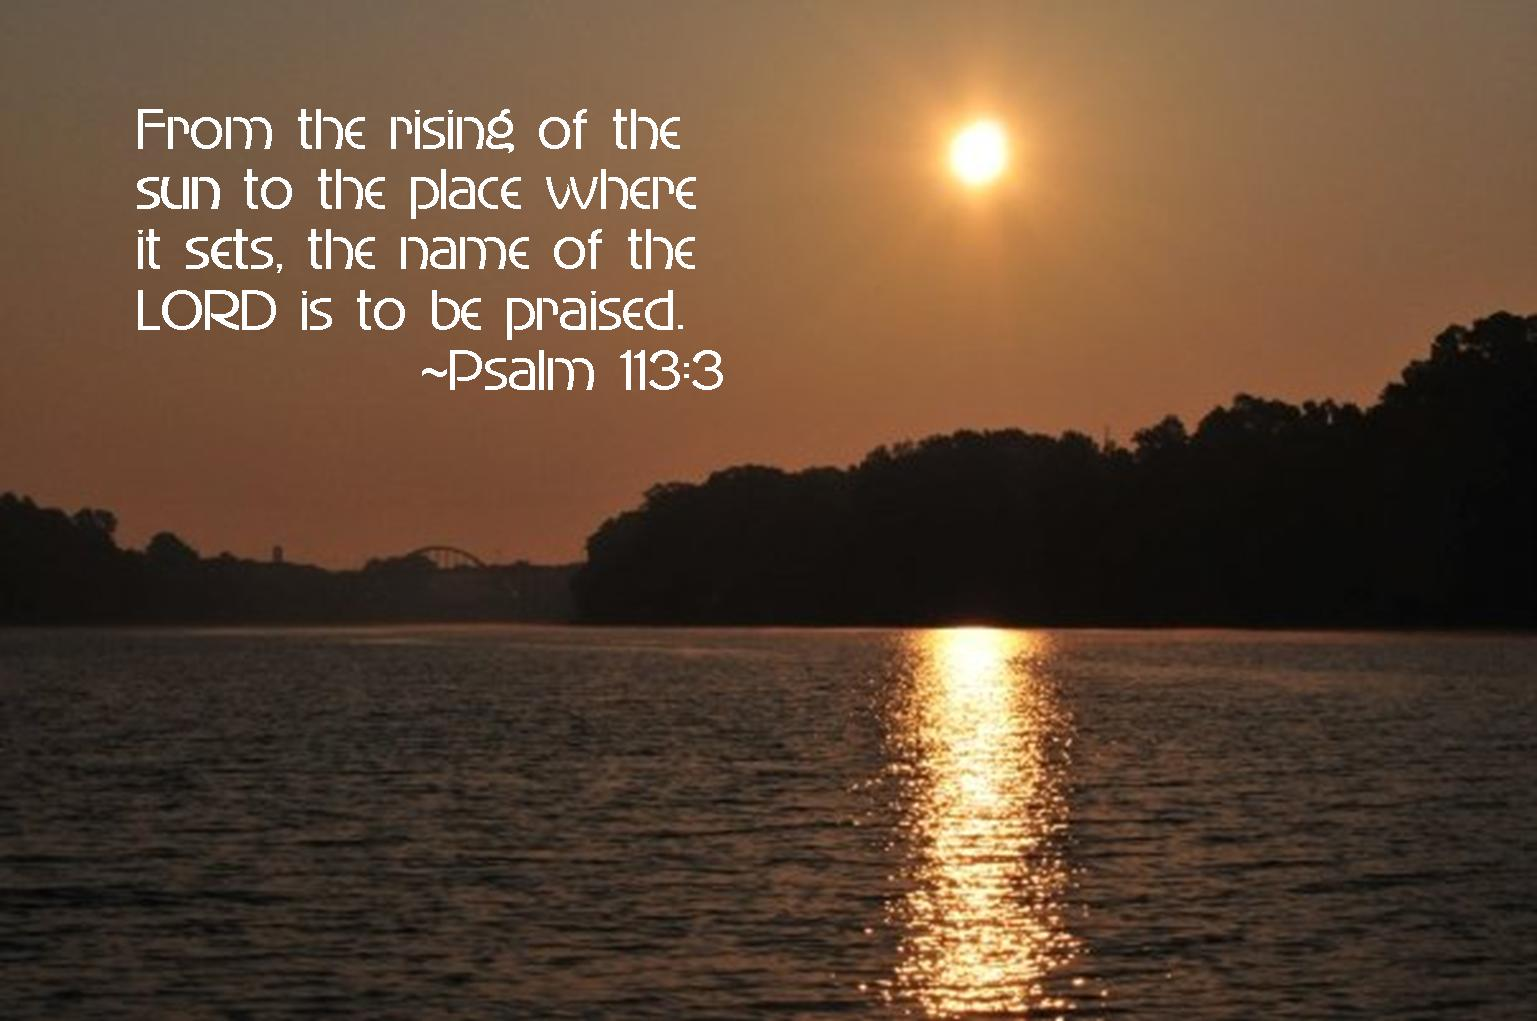 psalm-113-3